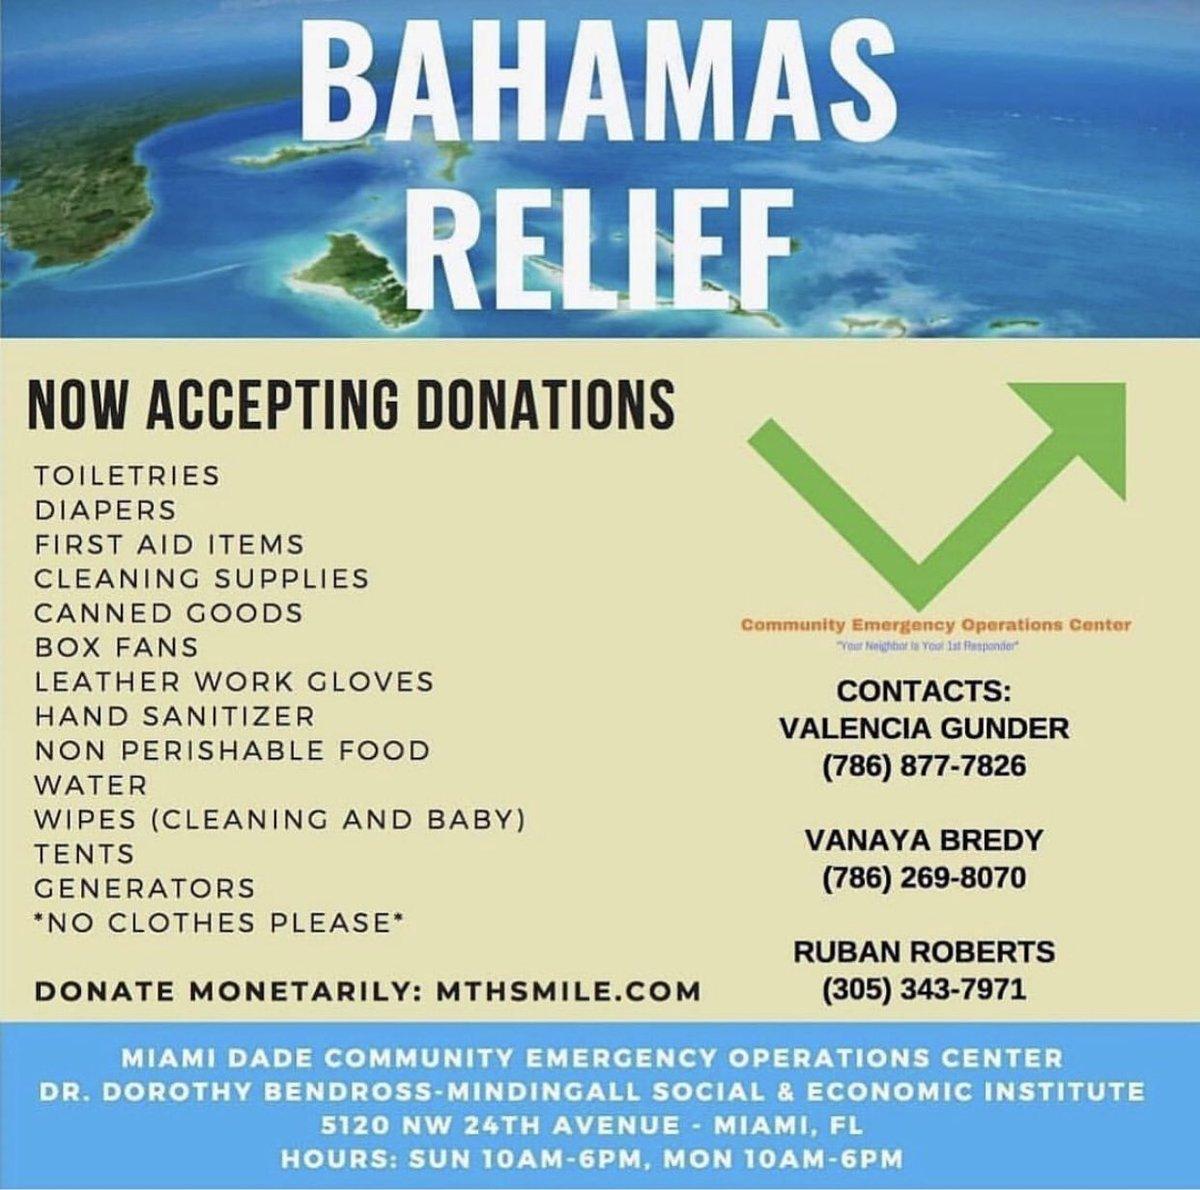 #TakeAction #Bahamas #HurricaneDorain https://t.co/NkiRFzFVY9